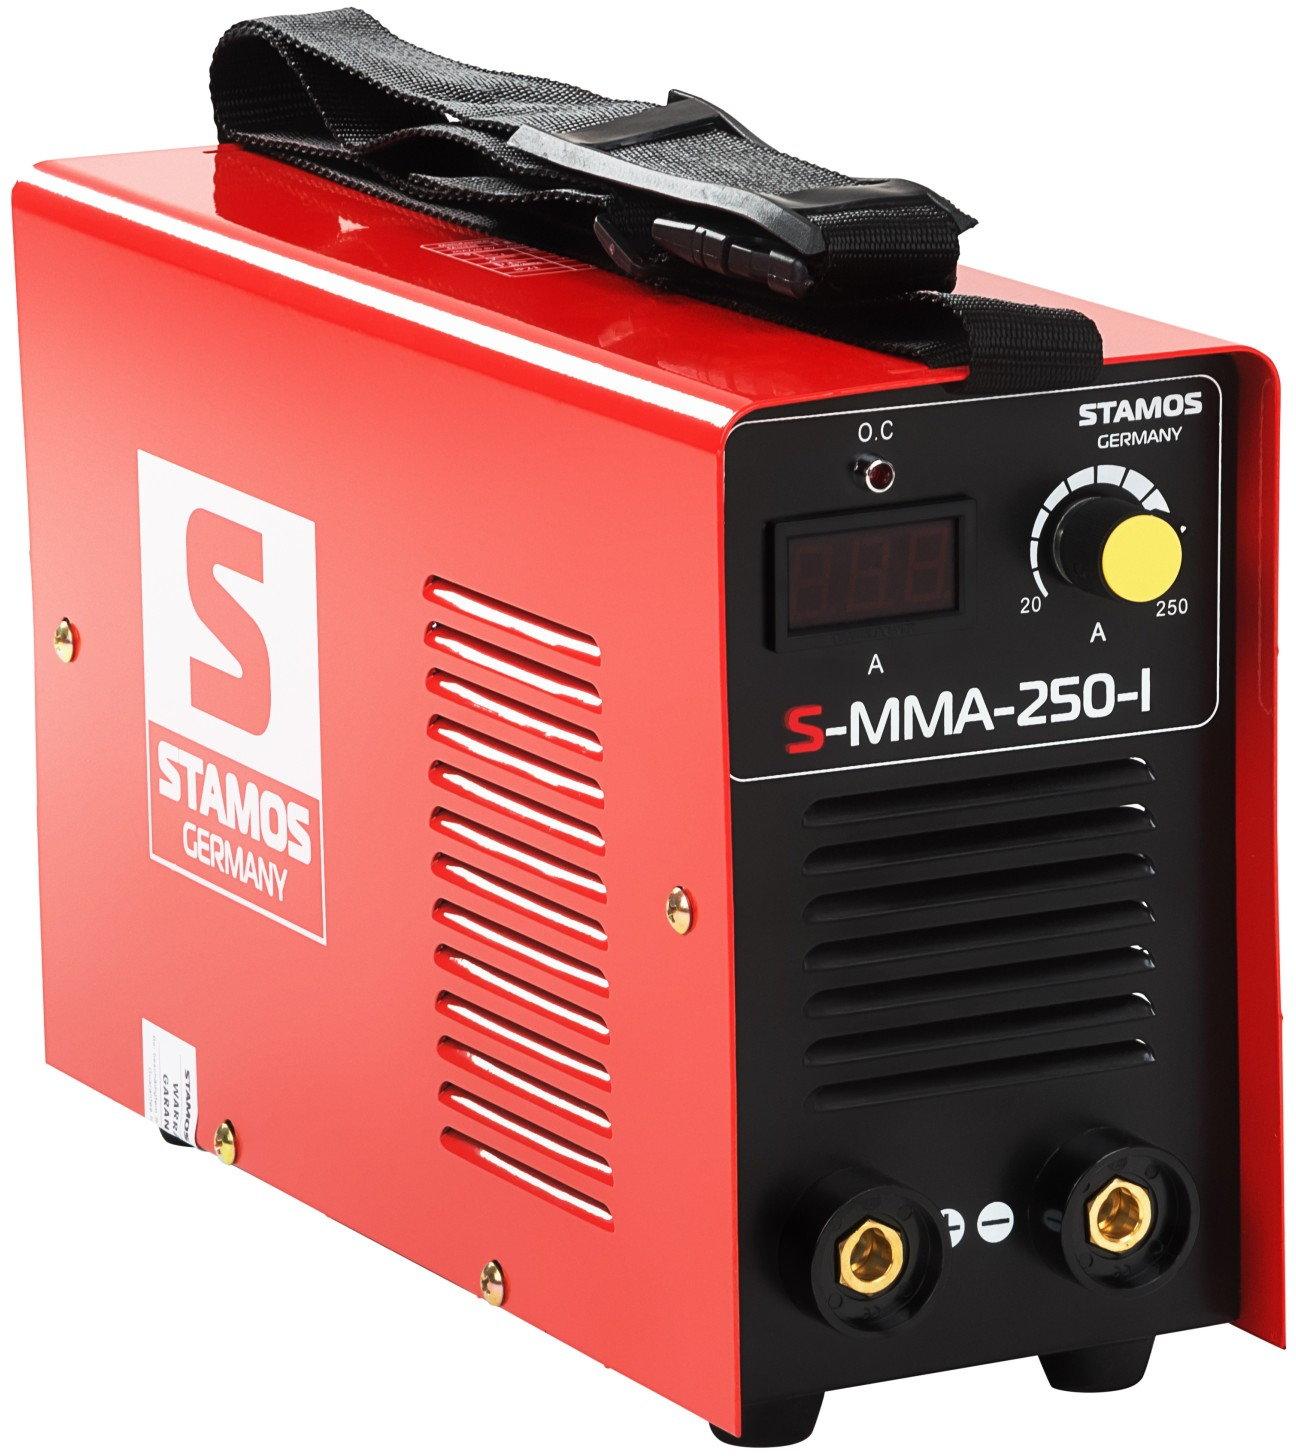 Stamos S-MMA-250-I